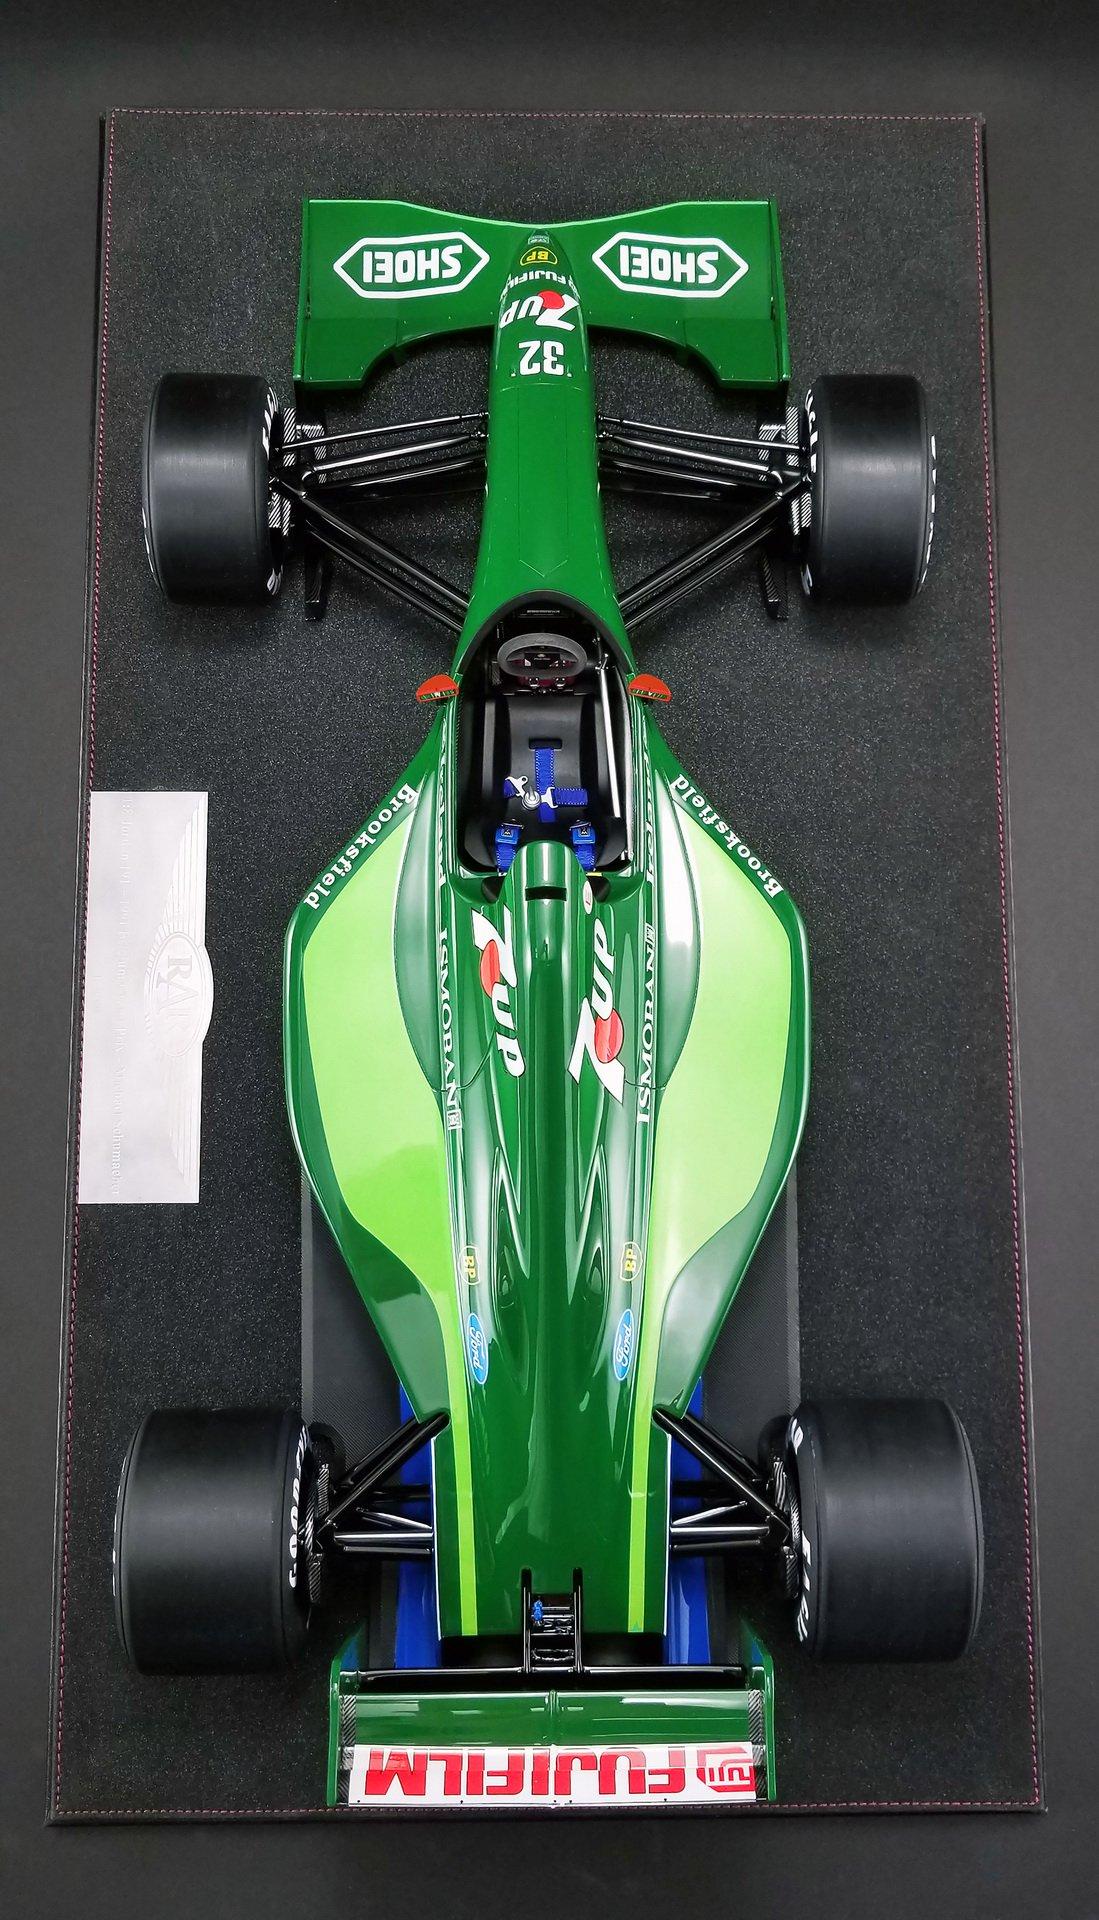 1991_Jordan_F1_car_Schumacher_scale_0002